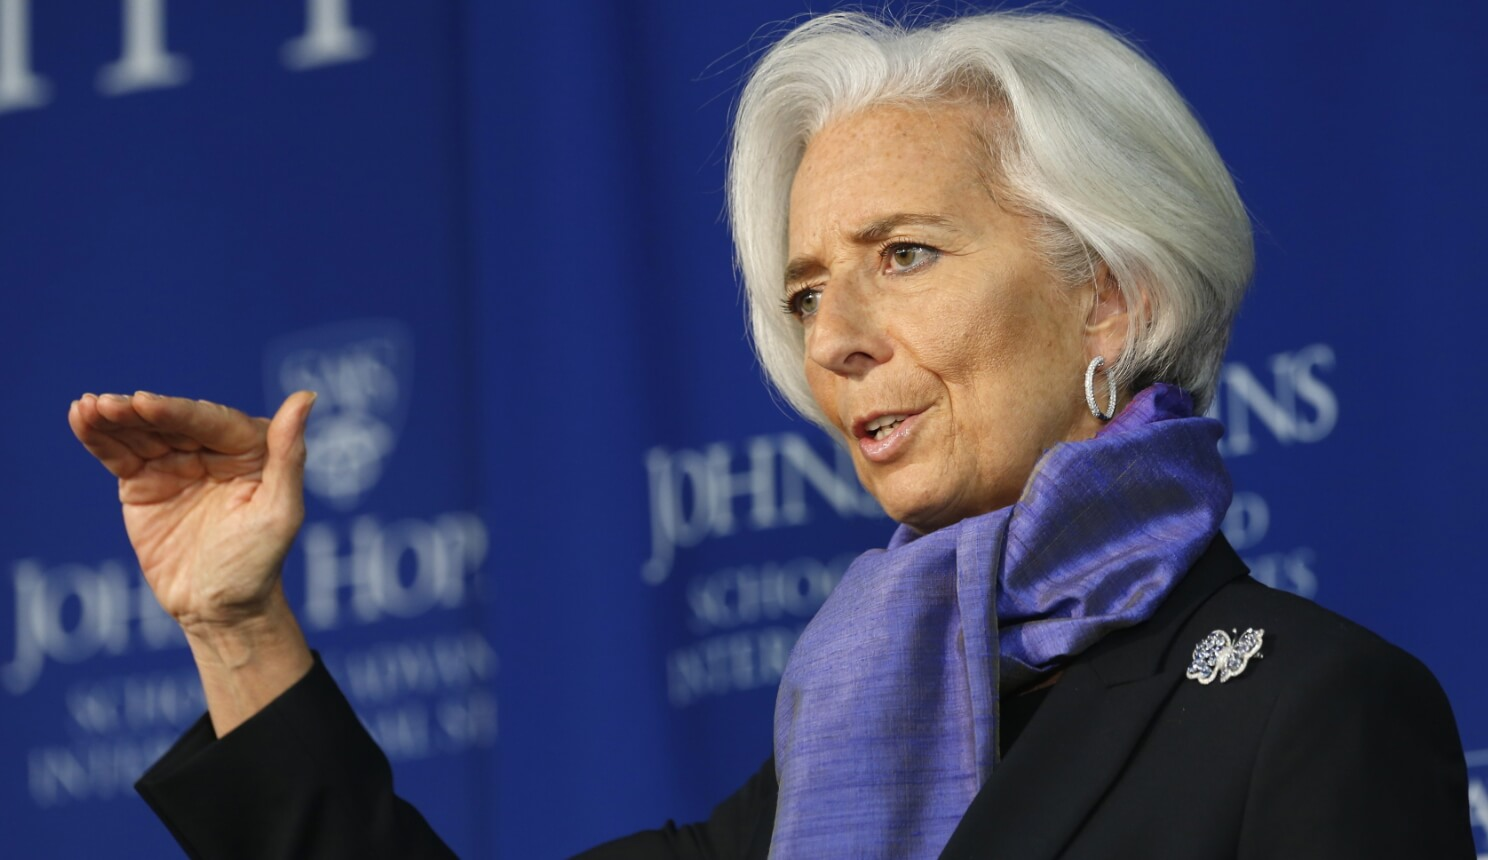 Мы будем на шаг впереди в развитии стейблкоинов, — глава ЕЦБ